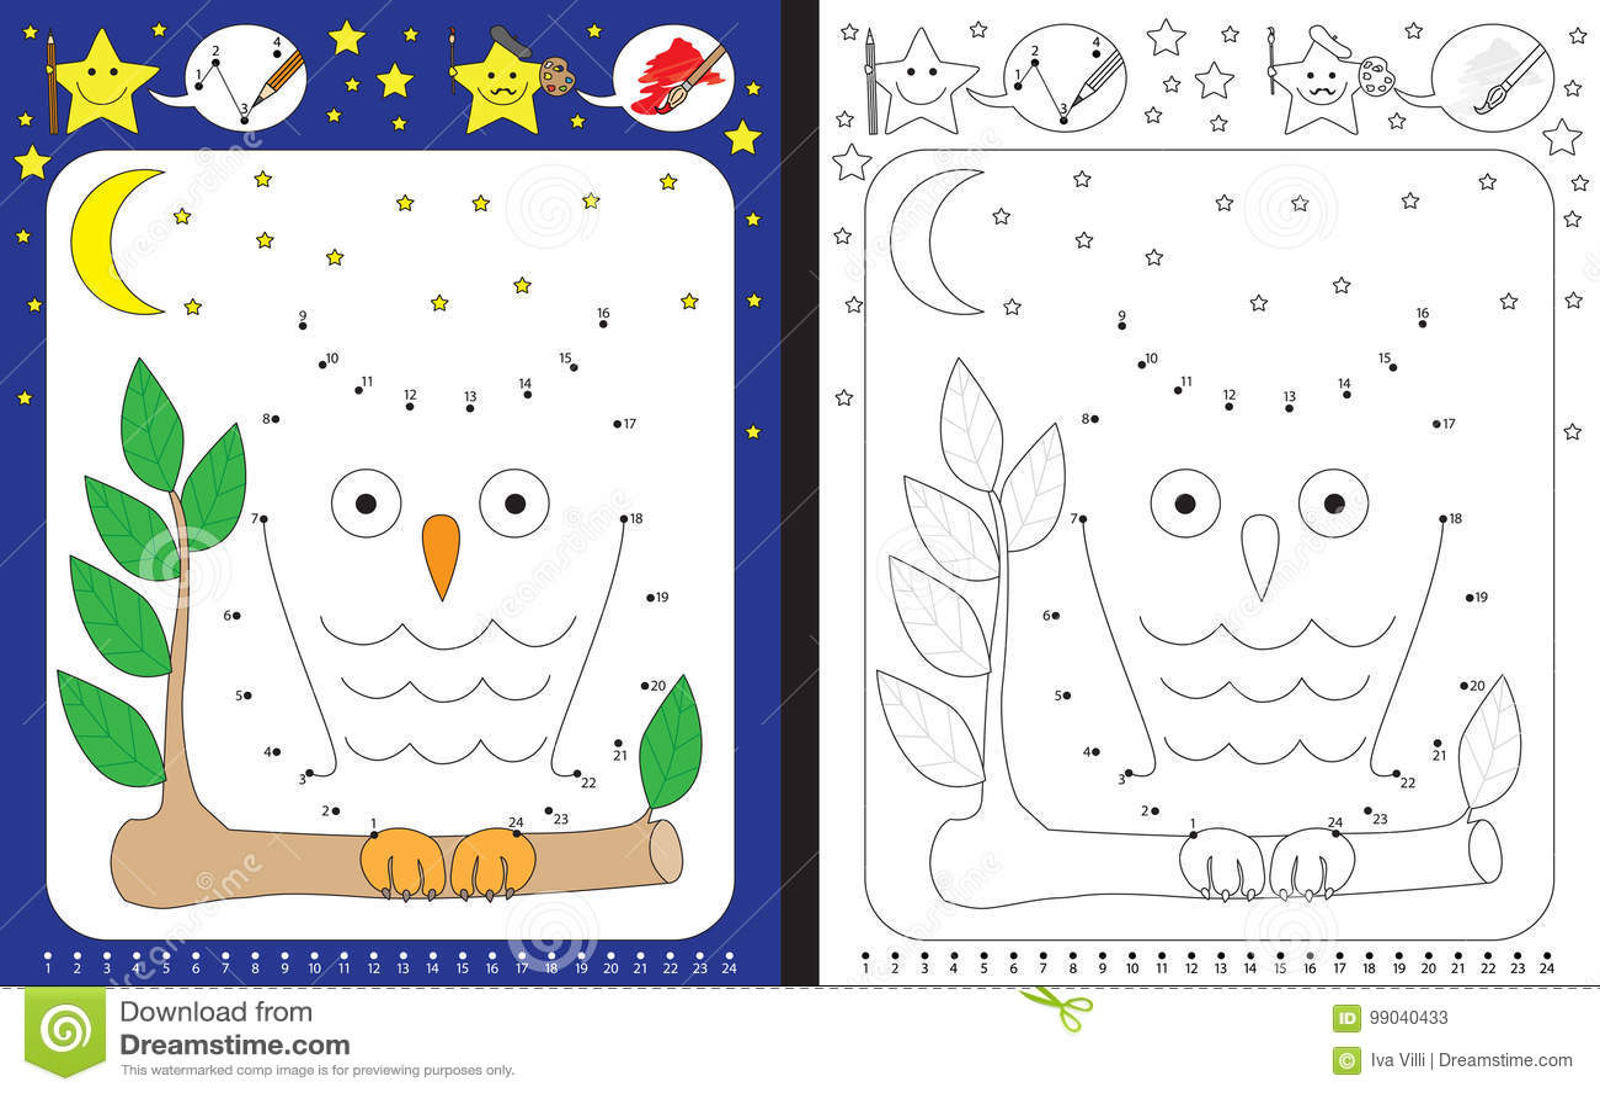 preschool worksheet stock vector illustration of kindergarten 99040433. Black Bedroom Furniture Sets. Home Design Ideas